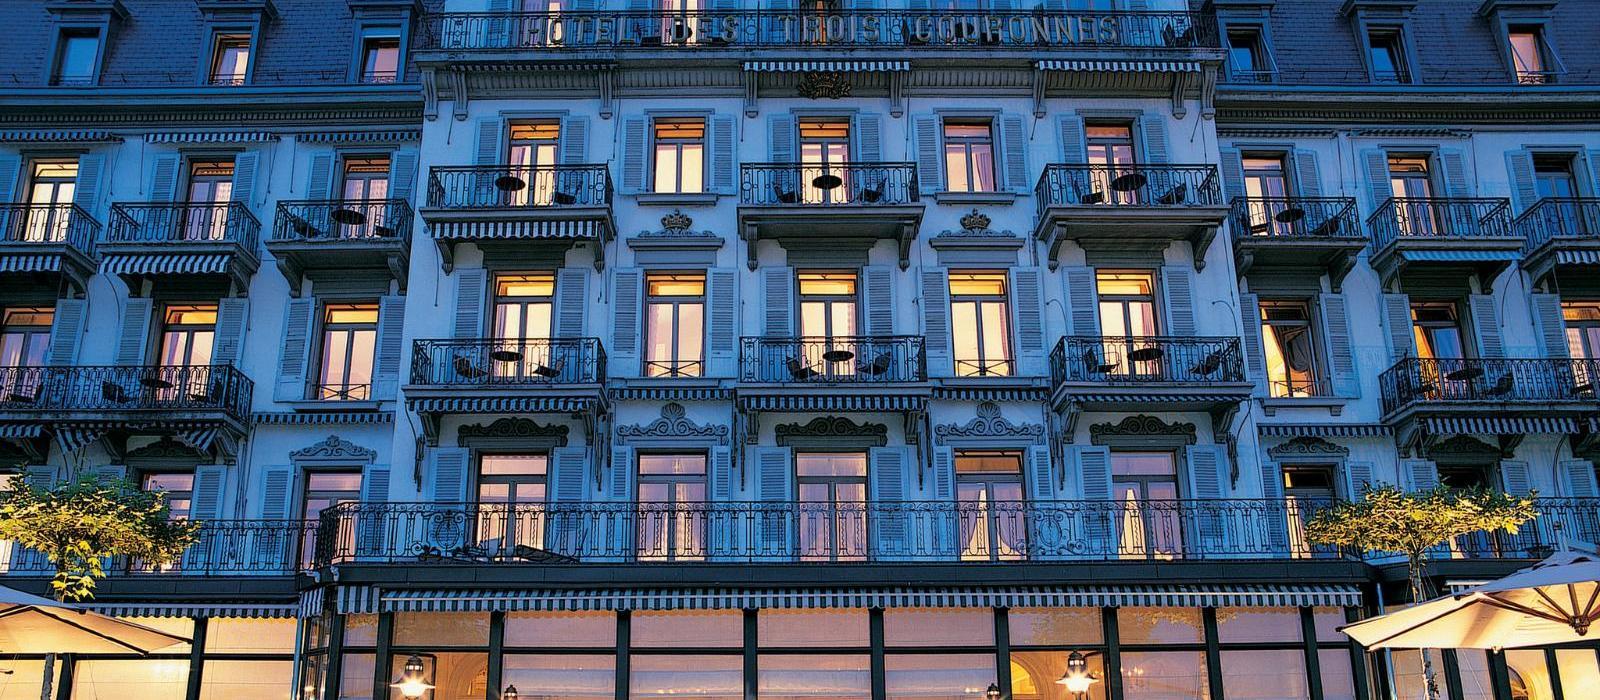 特罗伊古罗奈豪华水疗酒店(Hotel des Trois Couronnes & Destination Spa) 图片  www.lhw.cn